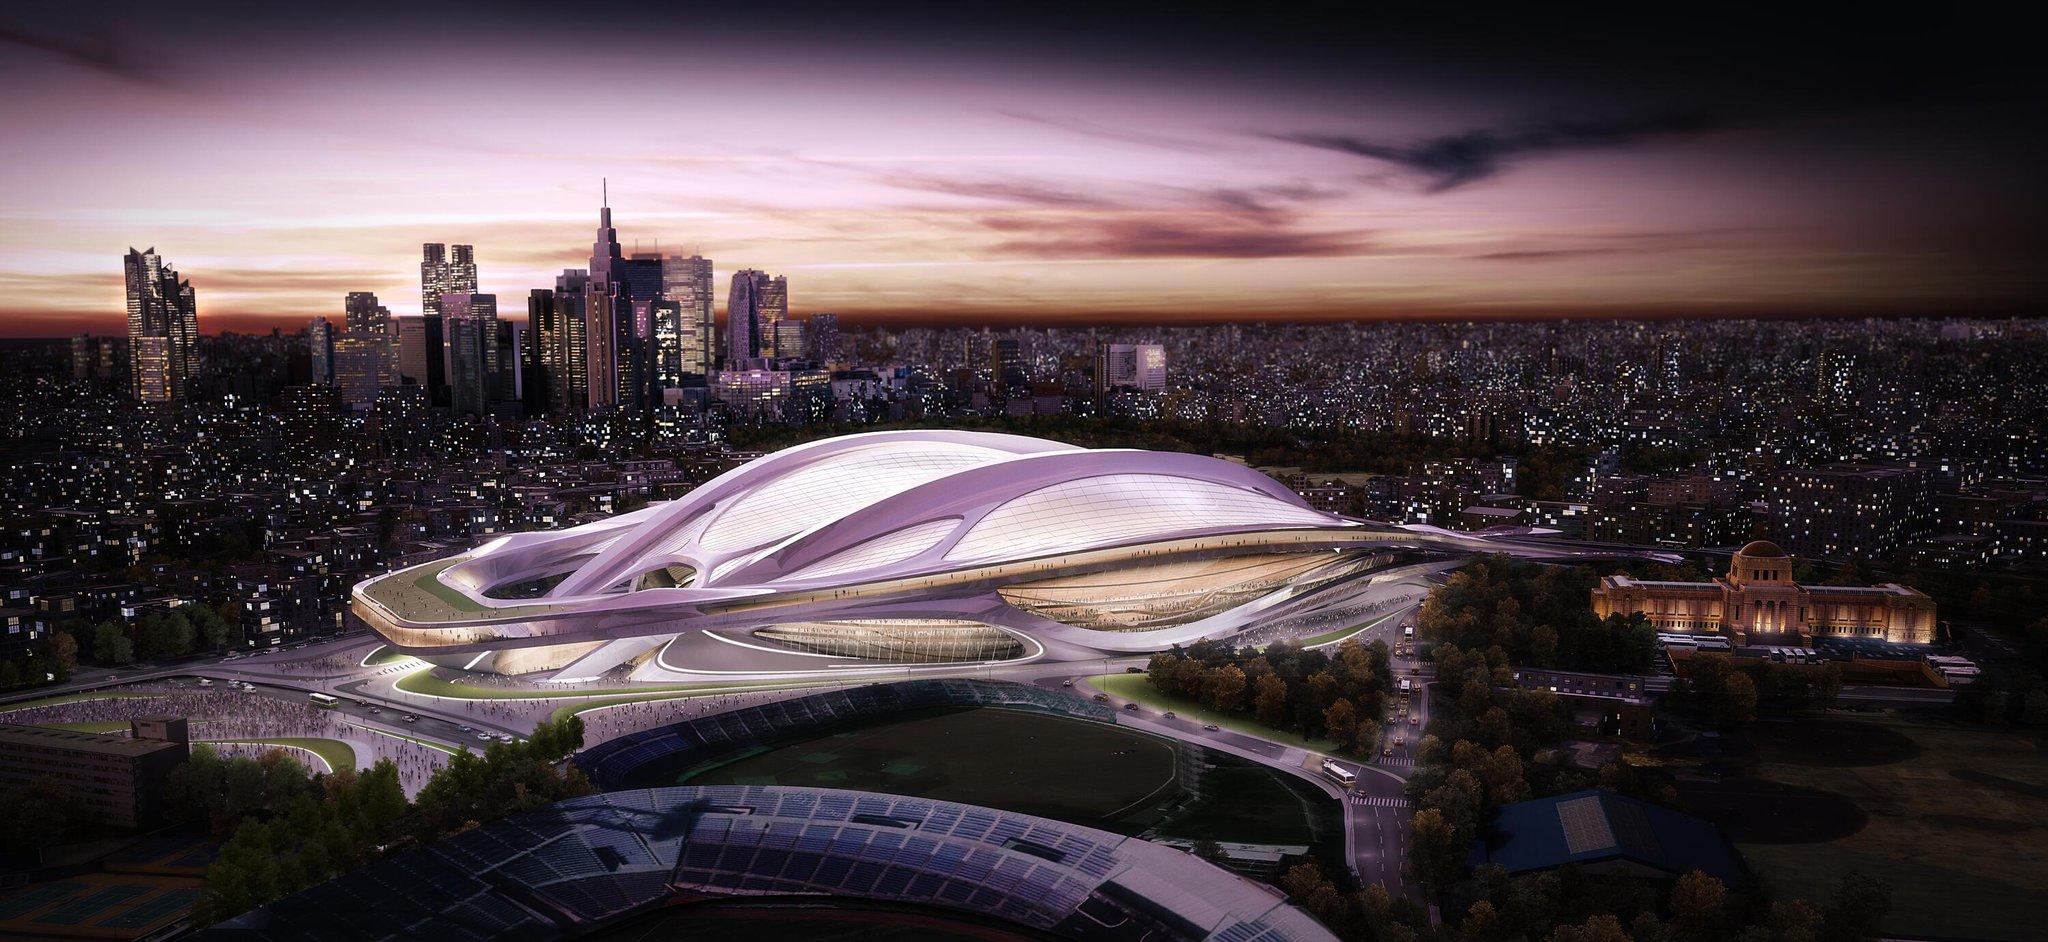 Hello Tokyo #olympics http://t.co/K2XnHoV4vk @UESE1